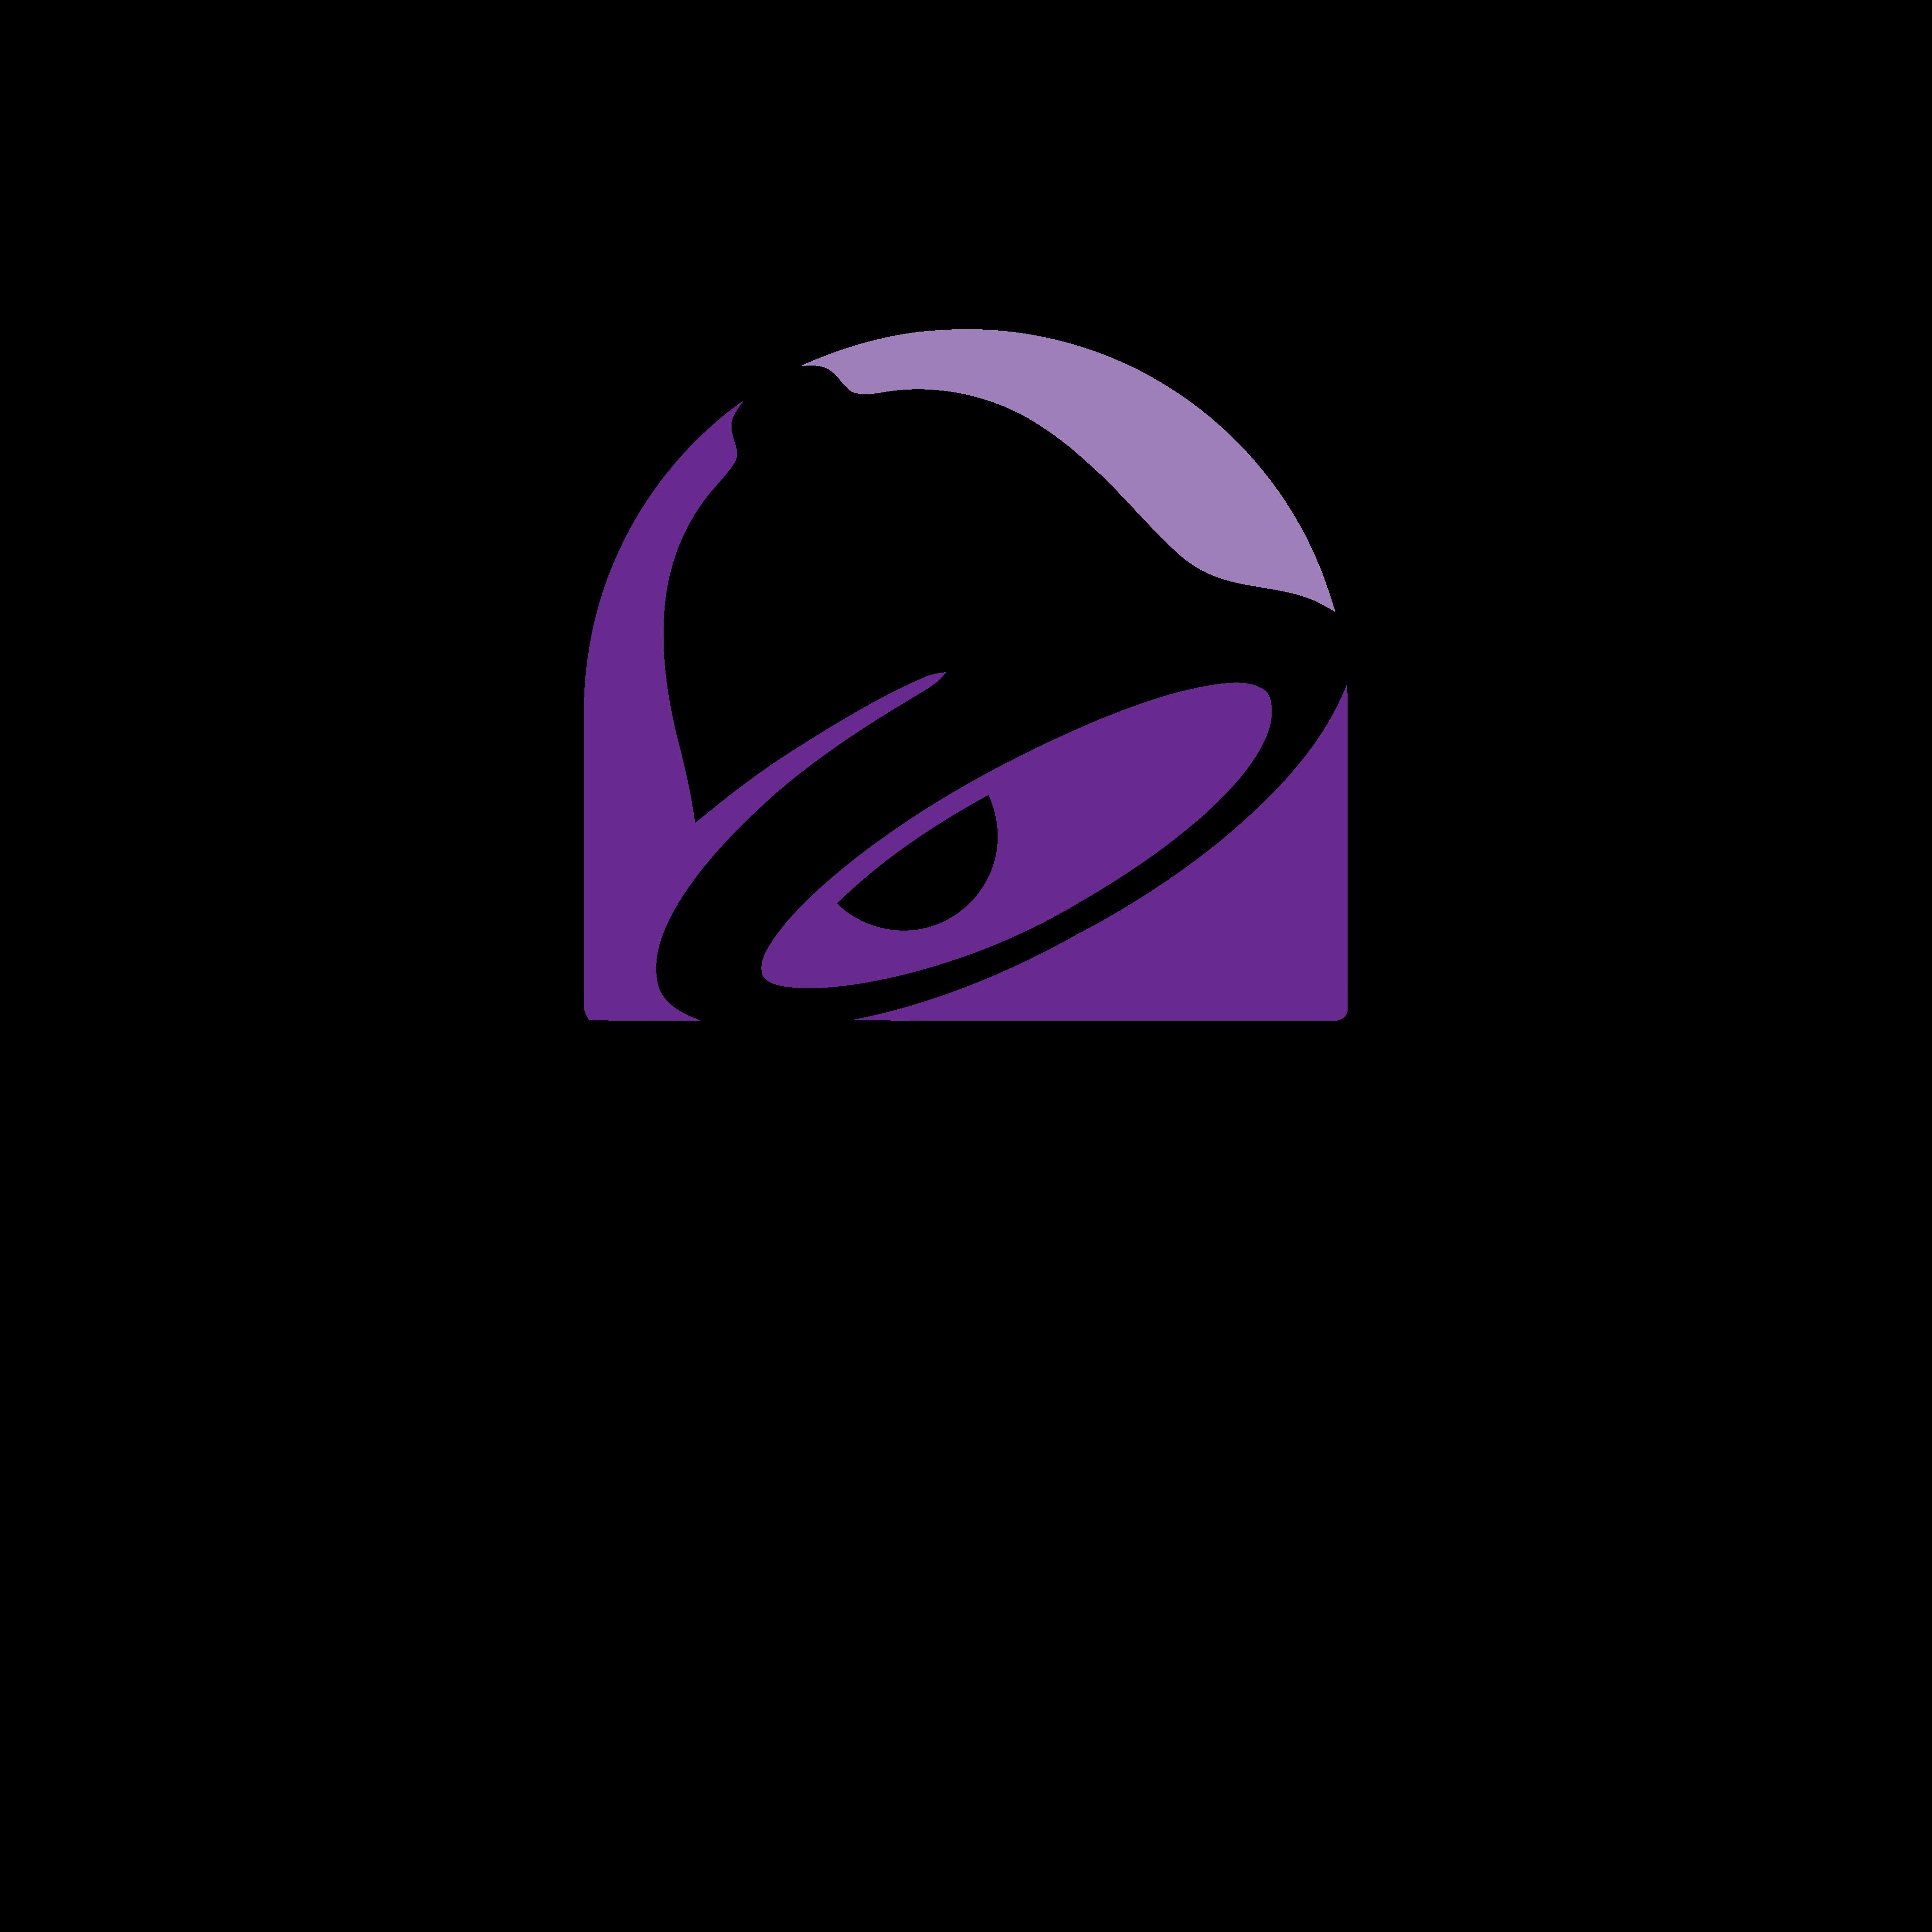 taco bell logo 0 - Taco Bell Logo